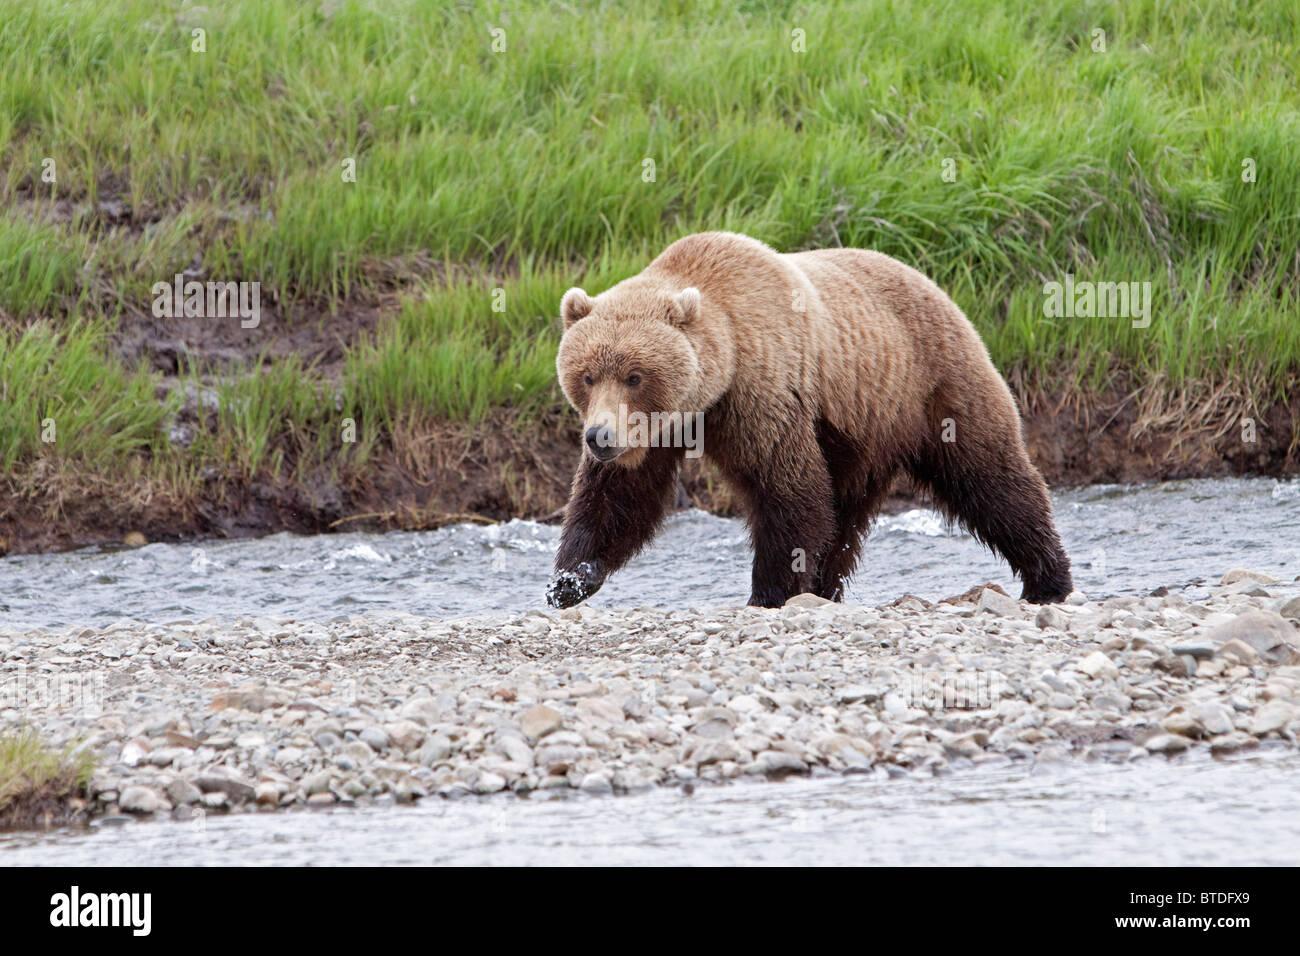 An adult Brown Bear walks along a rocky island in Mikfik Creek, McNeil River State Game Sanctuary, Southwest Alaska, - Stock Image